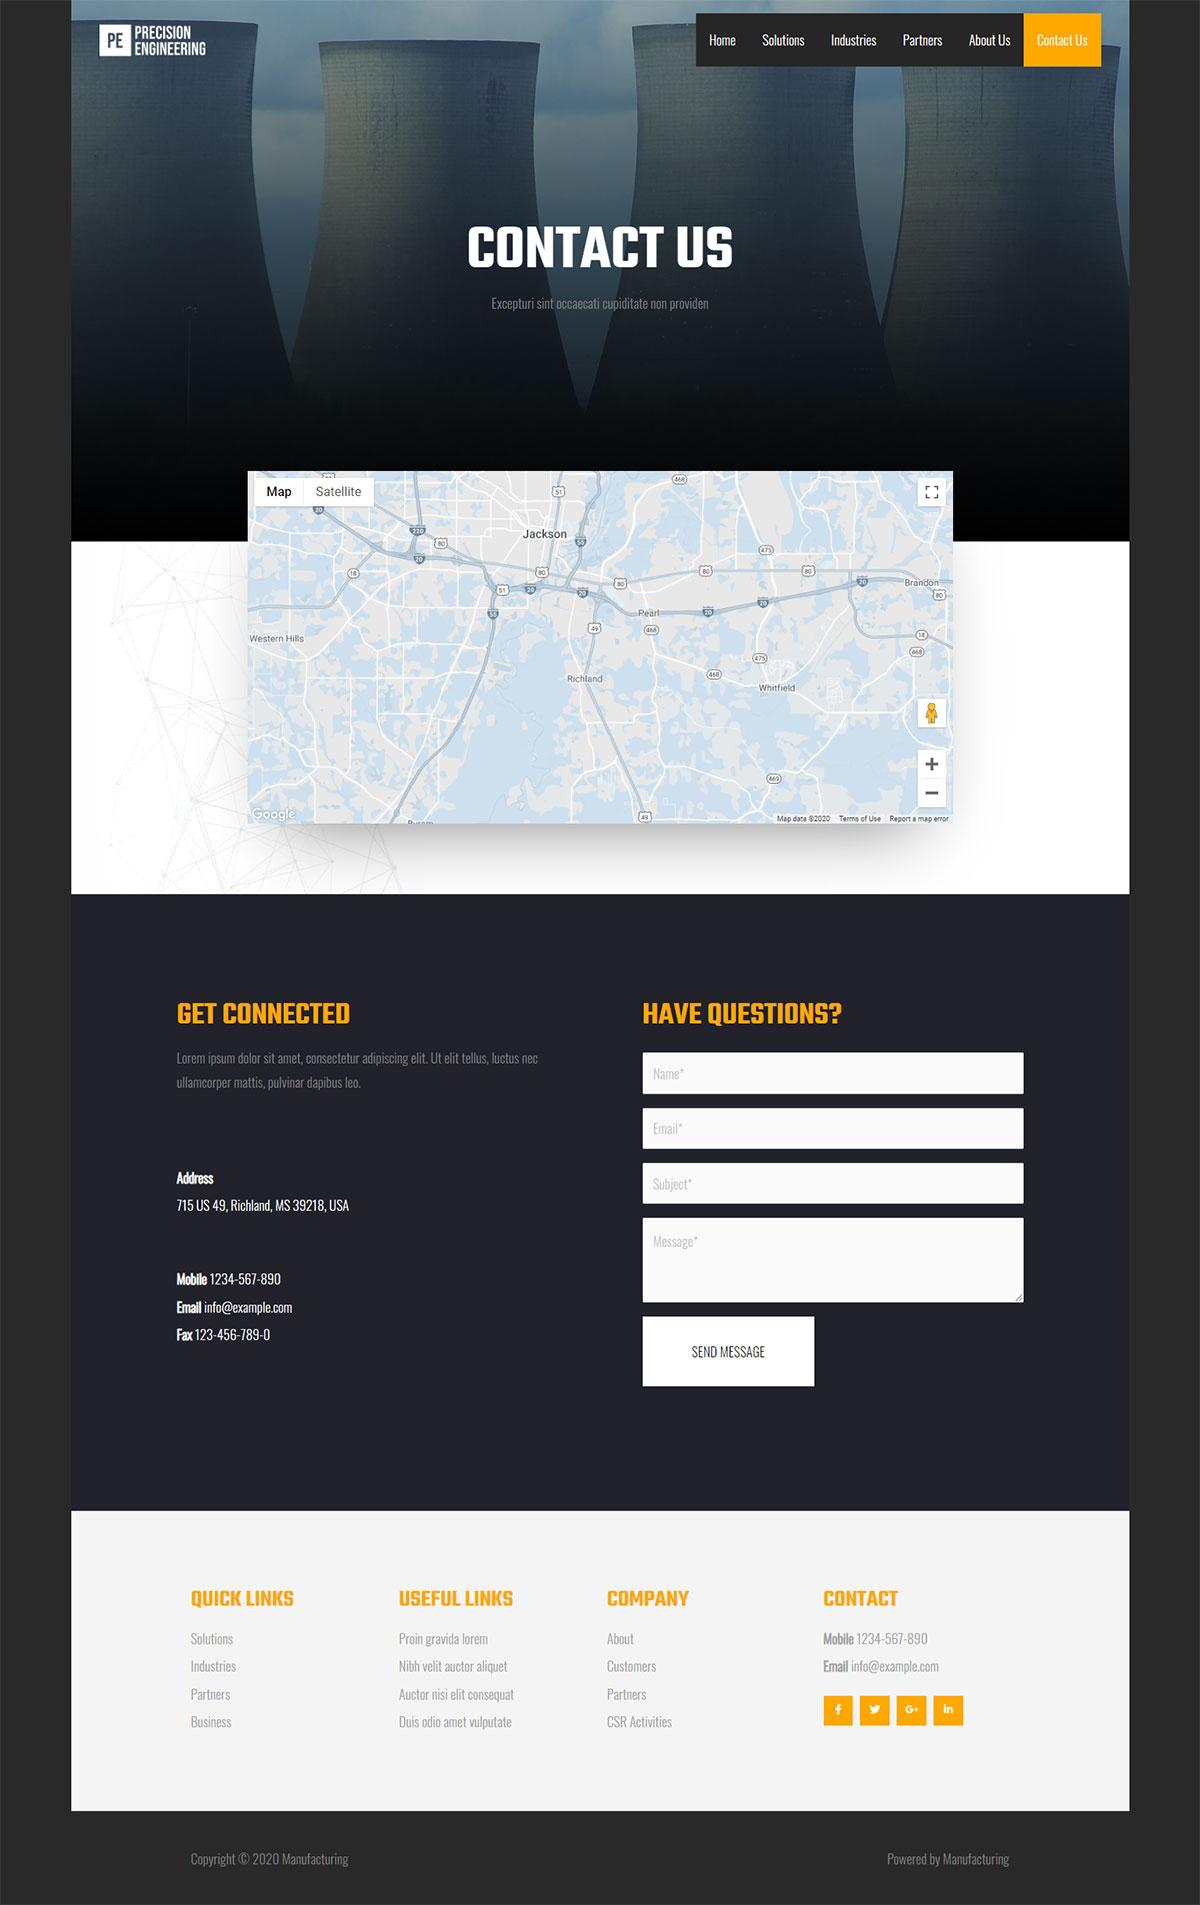 demo16-contact us